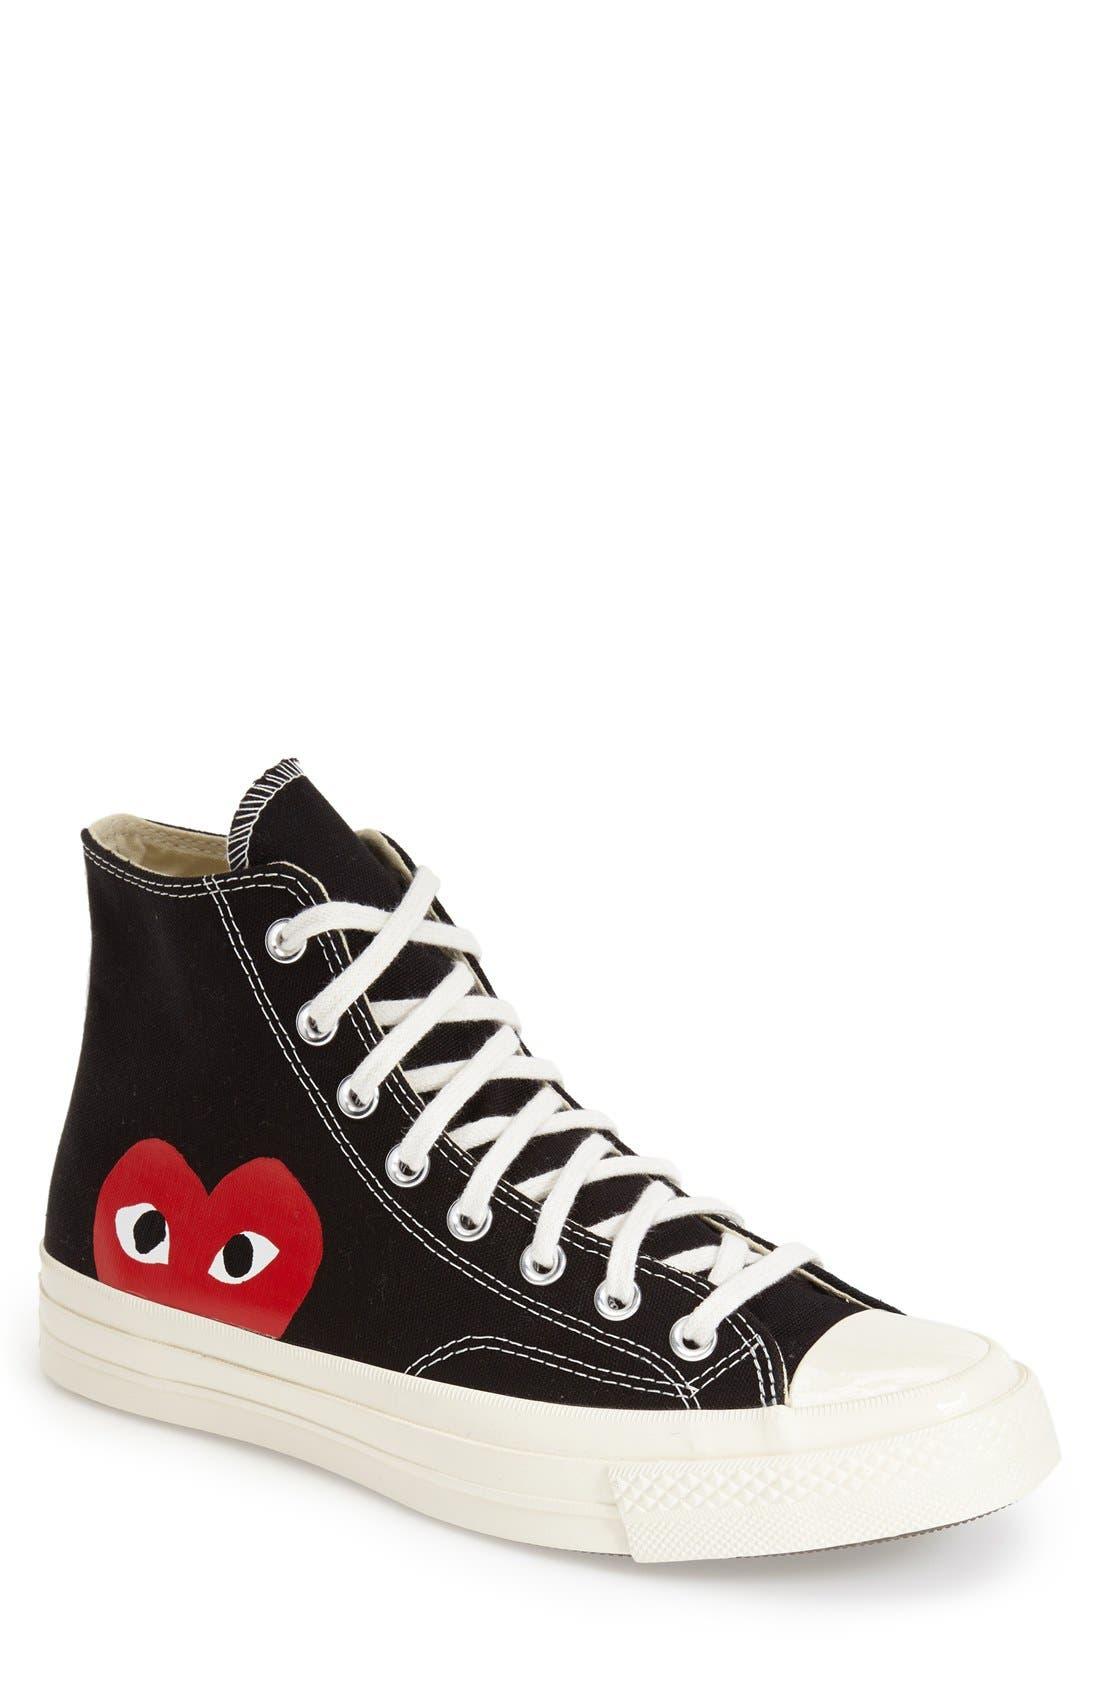 PLAYx Converse Chuck Taylor<sup>®</sup> - Hidden Heart High TopSneaker,                             Main thumbnail 1, color,                             BLACK CANVAS